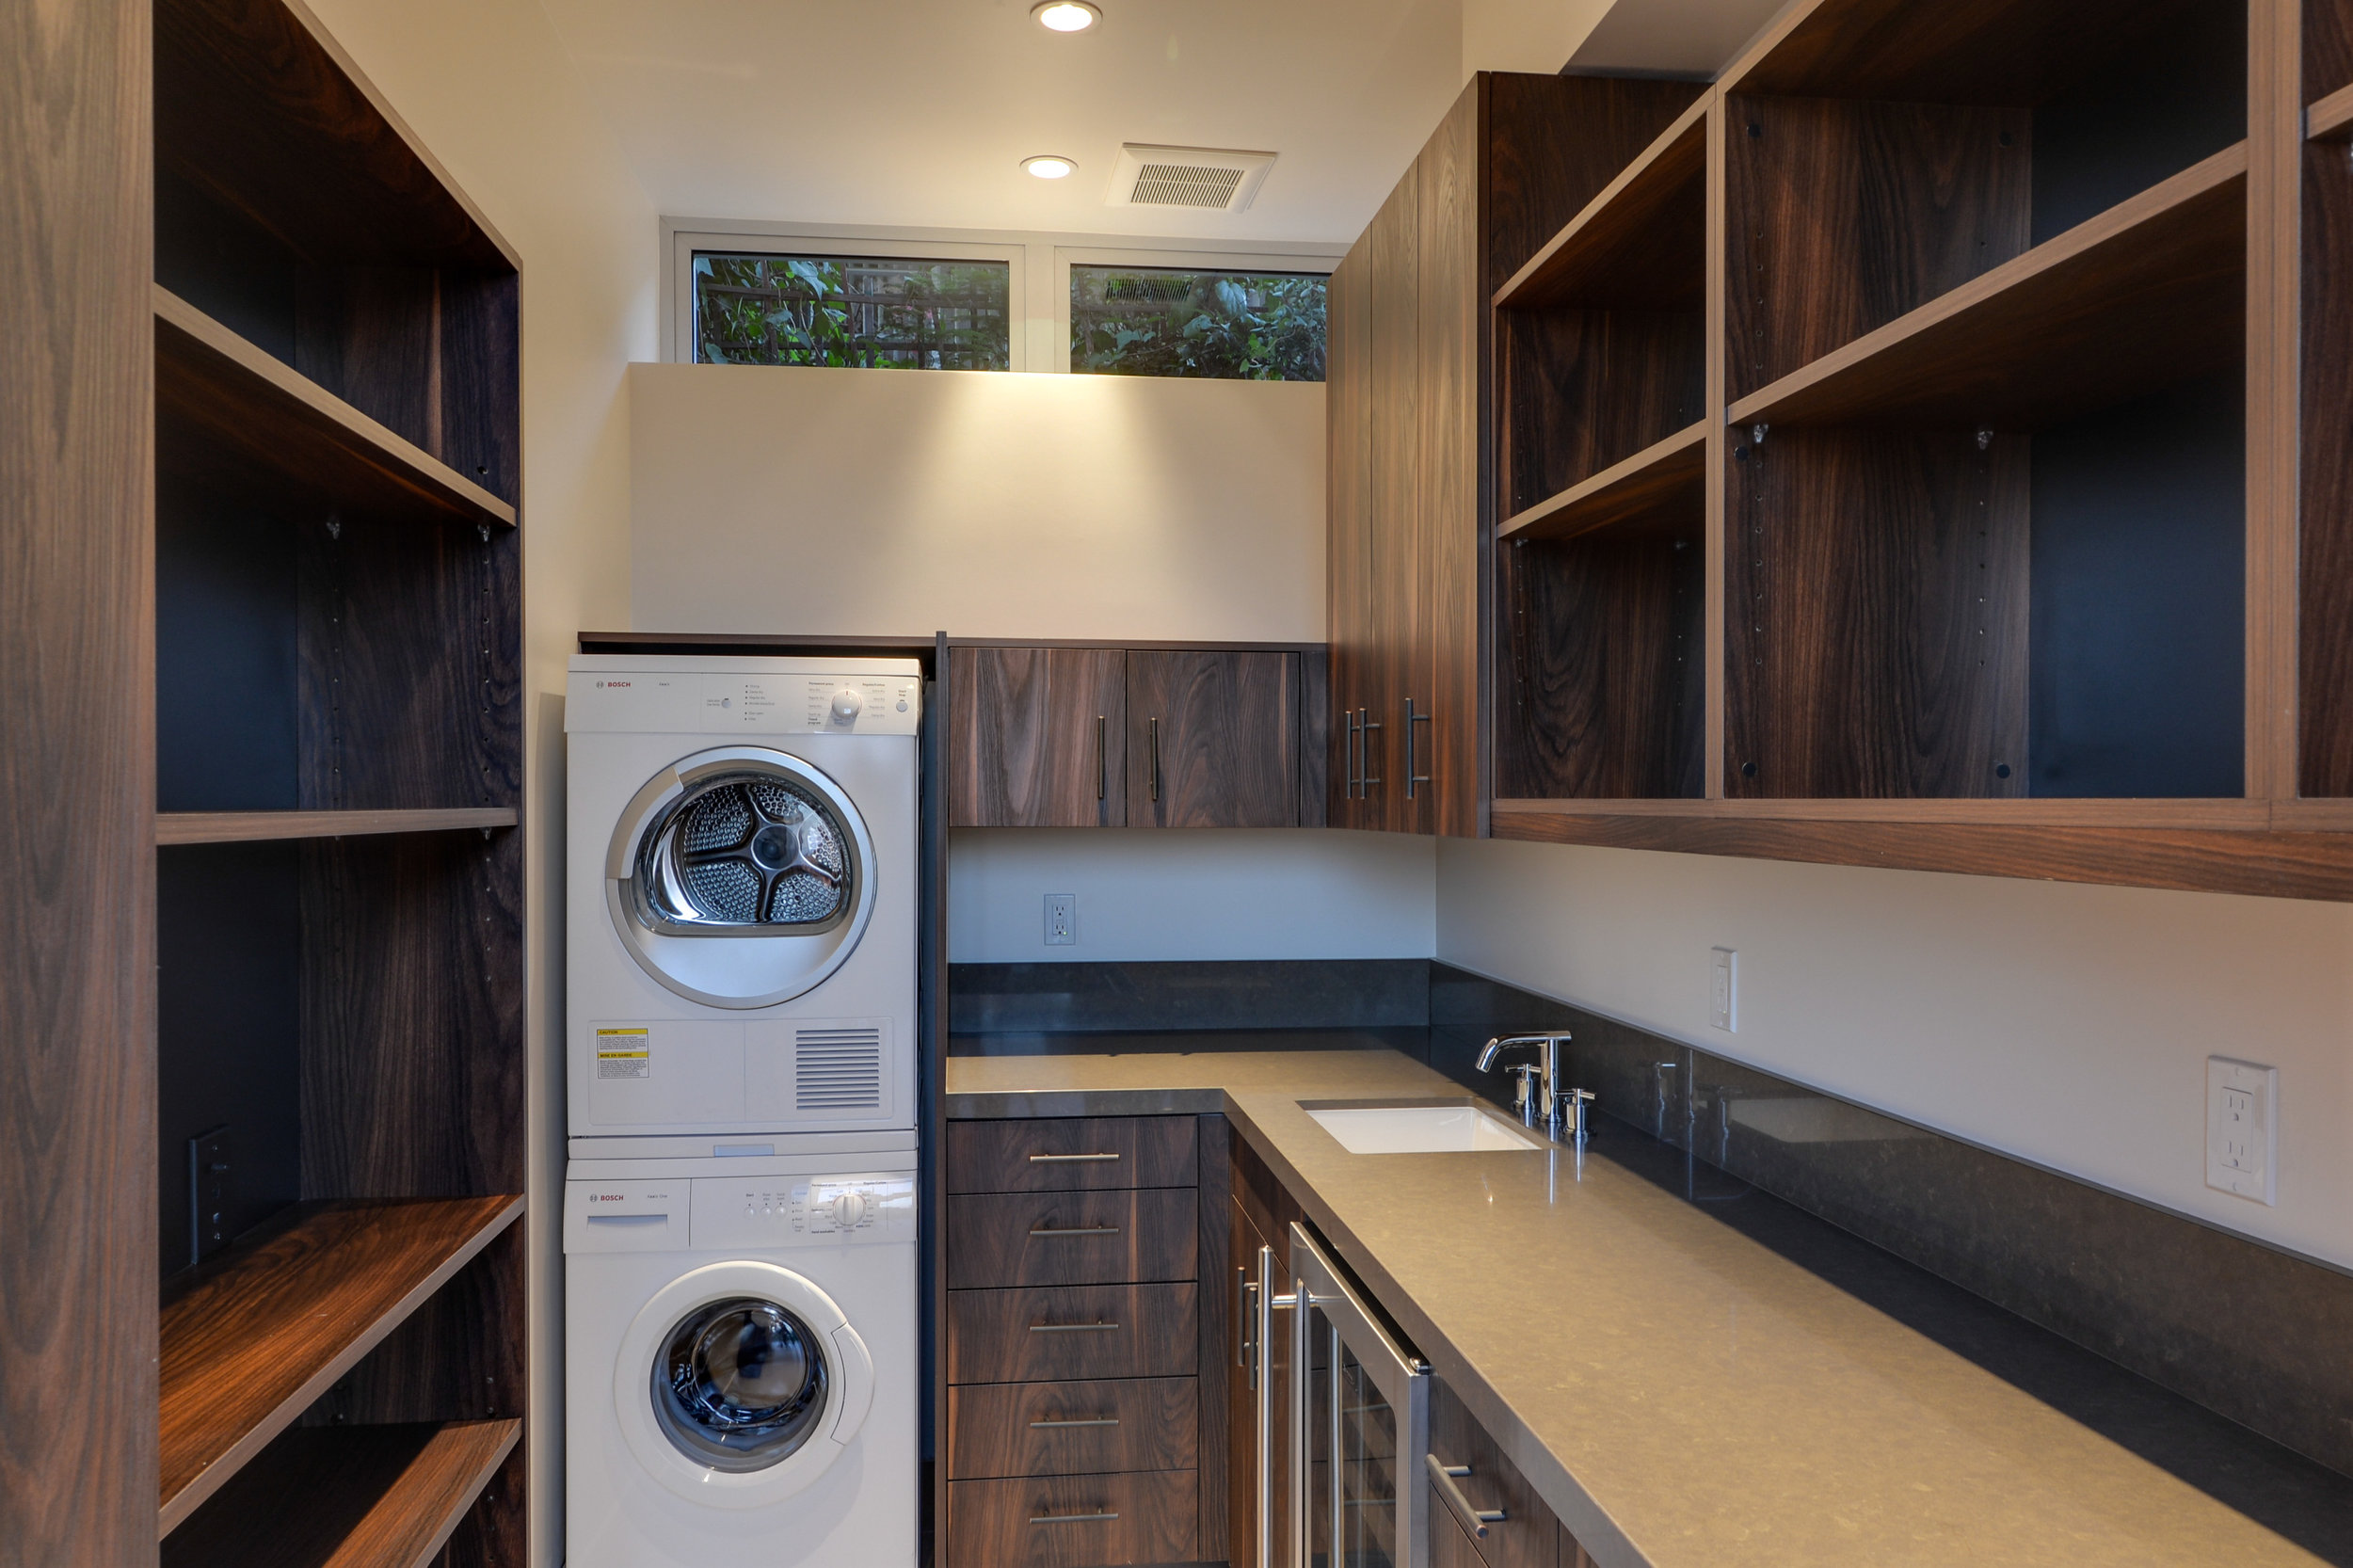 S.E.A.-Studio-Environmental-Architecture-David-Hertz-FAIA-Linda-Rosa-House-La-Jolla-San-Diego-sustainable-regenerative-restorative-design-modern-residential-mindful-garden-panoramic-ocean-view-open-concept-california-dream-10.jpg